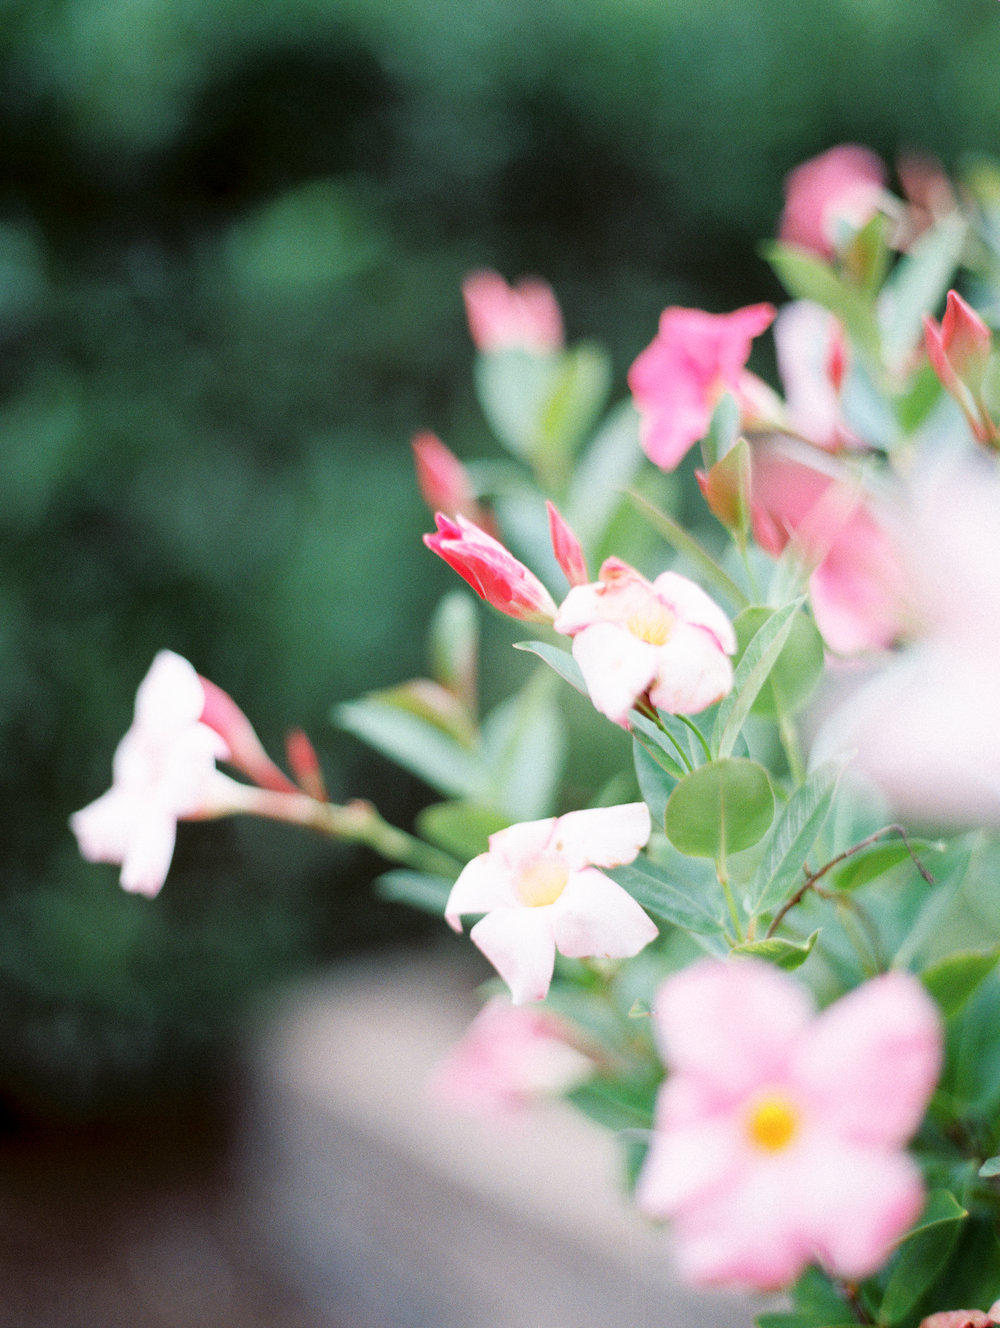 Weaver_Family_Botanical_Gardens_Columbus_Georgia_Fallen_Photography-96.JPG